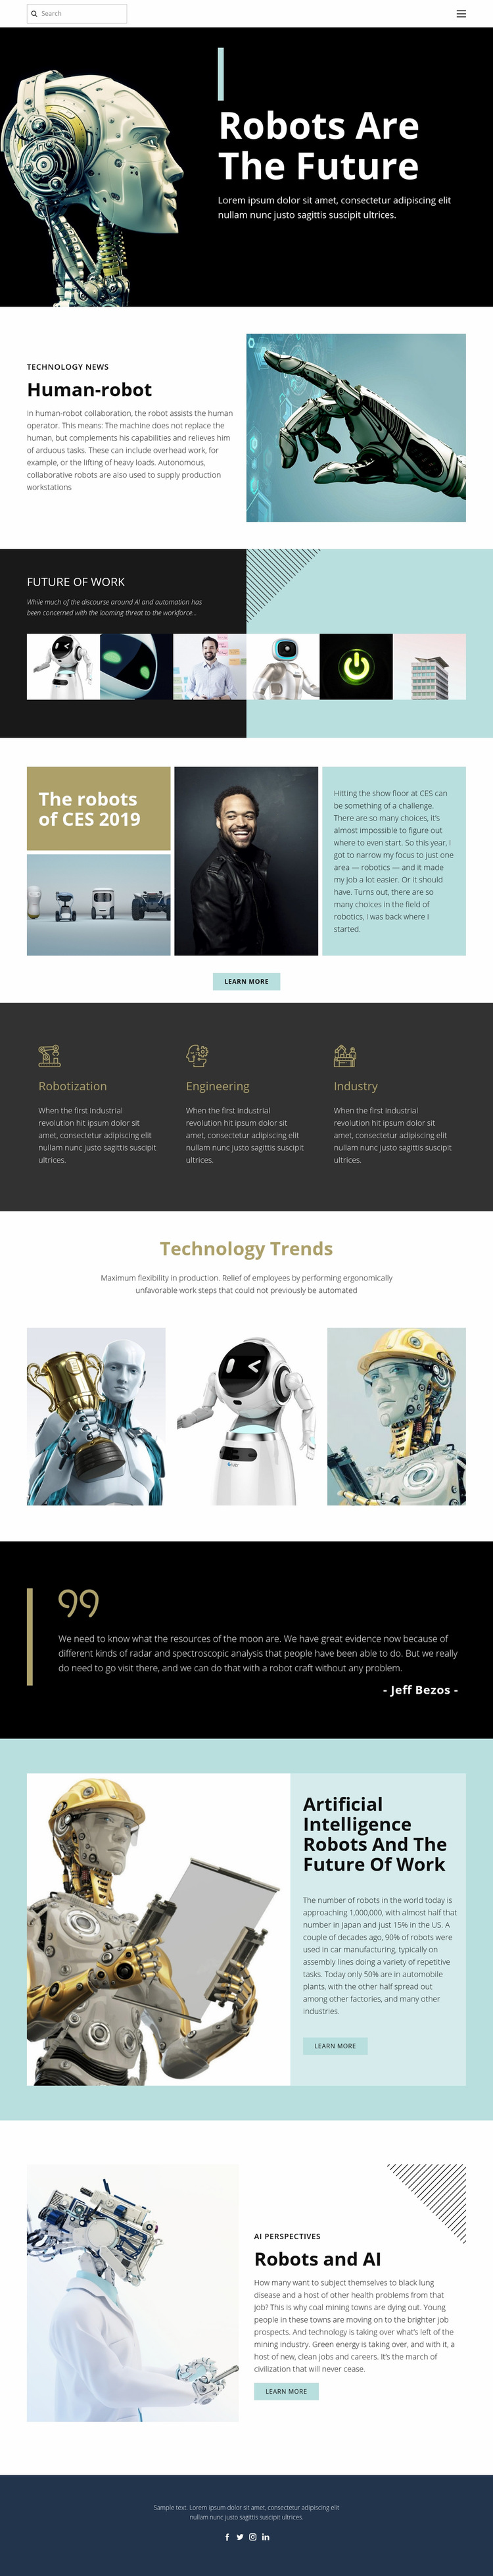 Already future technology Web Page Design